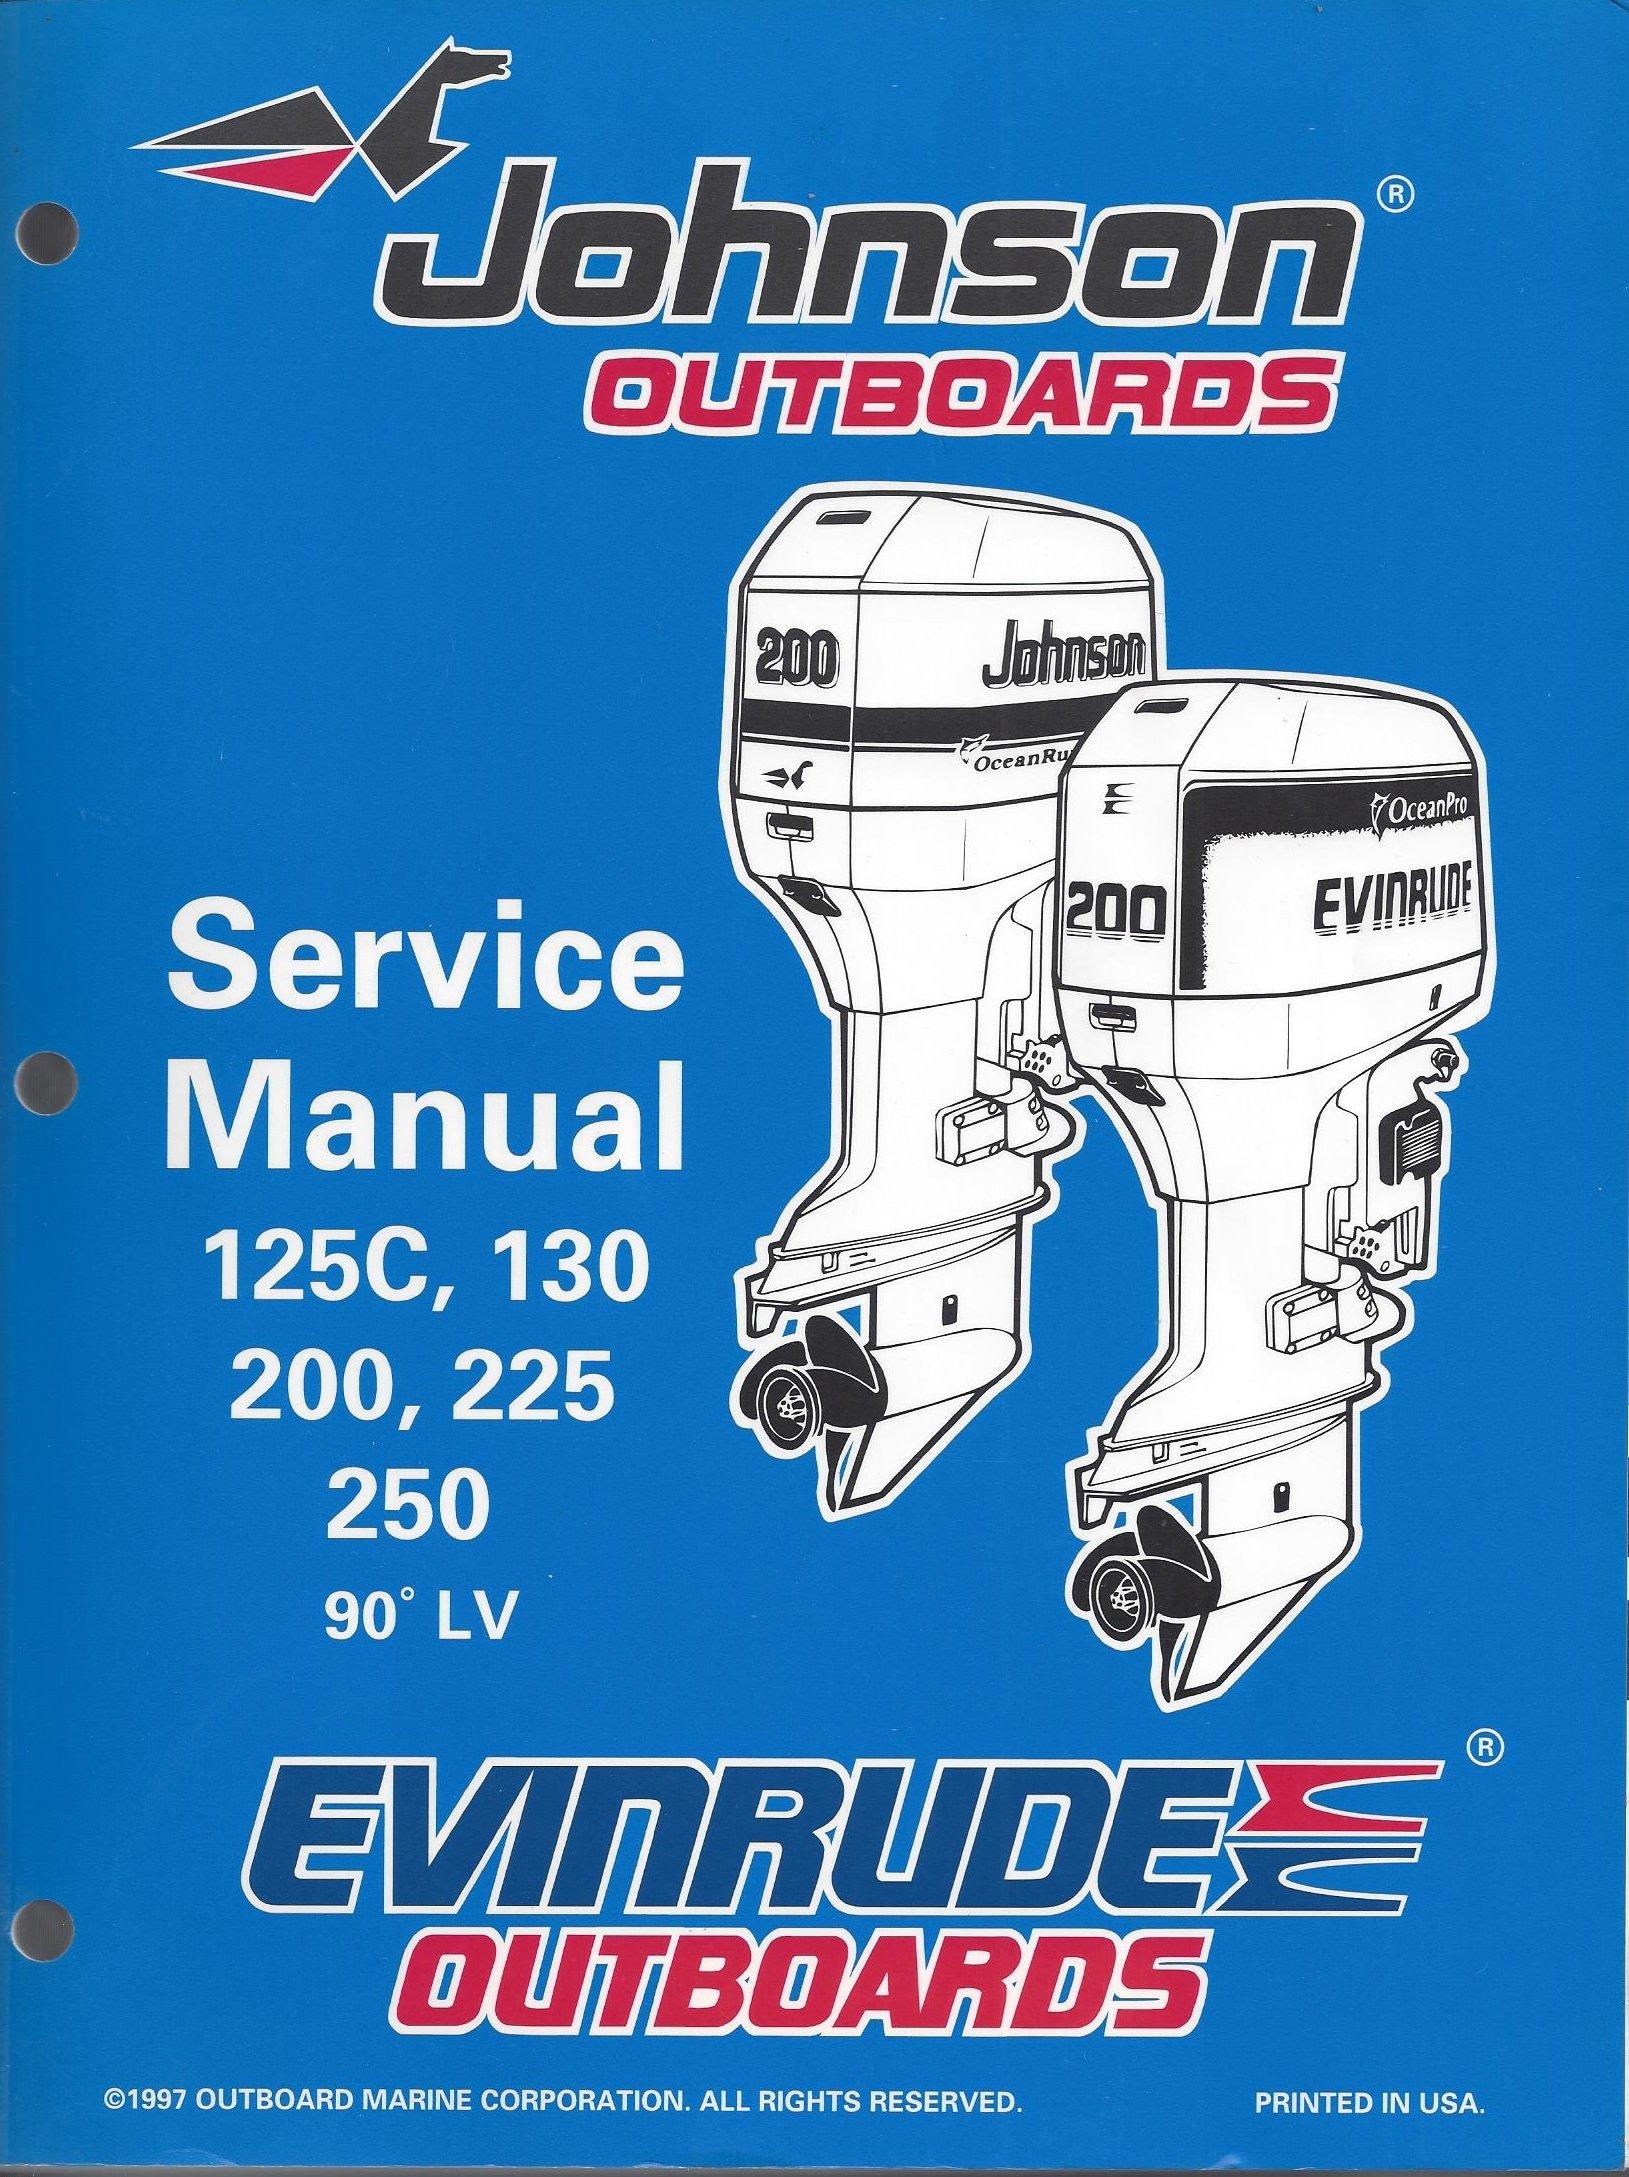 "Johnson Evinrude Outboards ""EC"" 90* LV Service Manual 125C, 130, 200, 225,  250 P/N 520212: Amazon.com: Books"